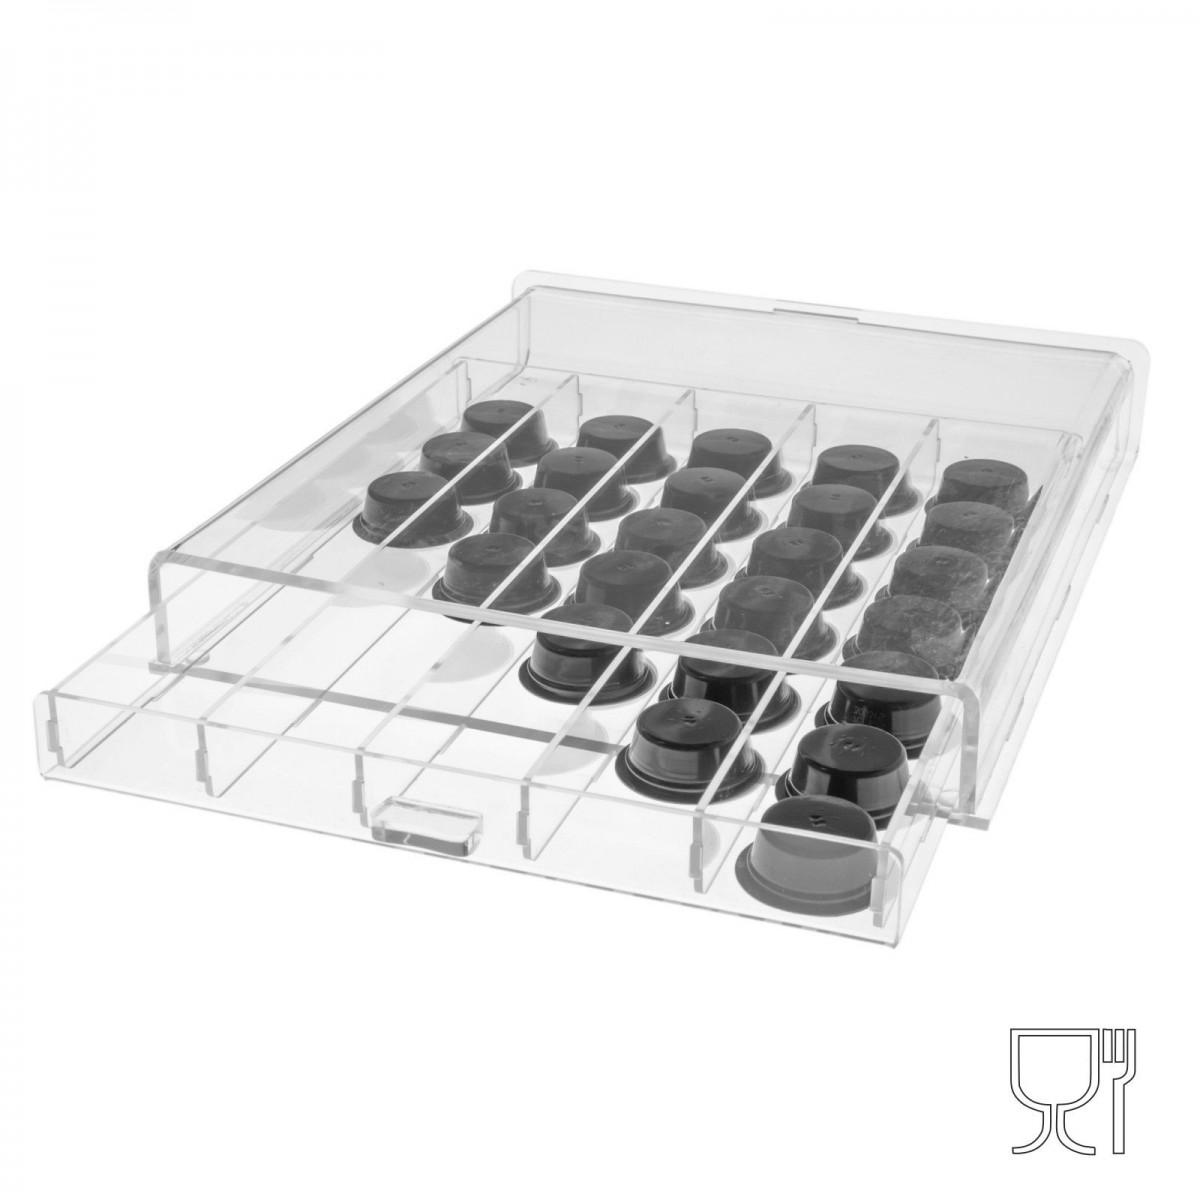 Clear Acrylic coffee capsule box holder